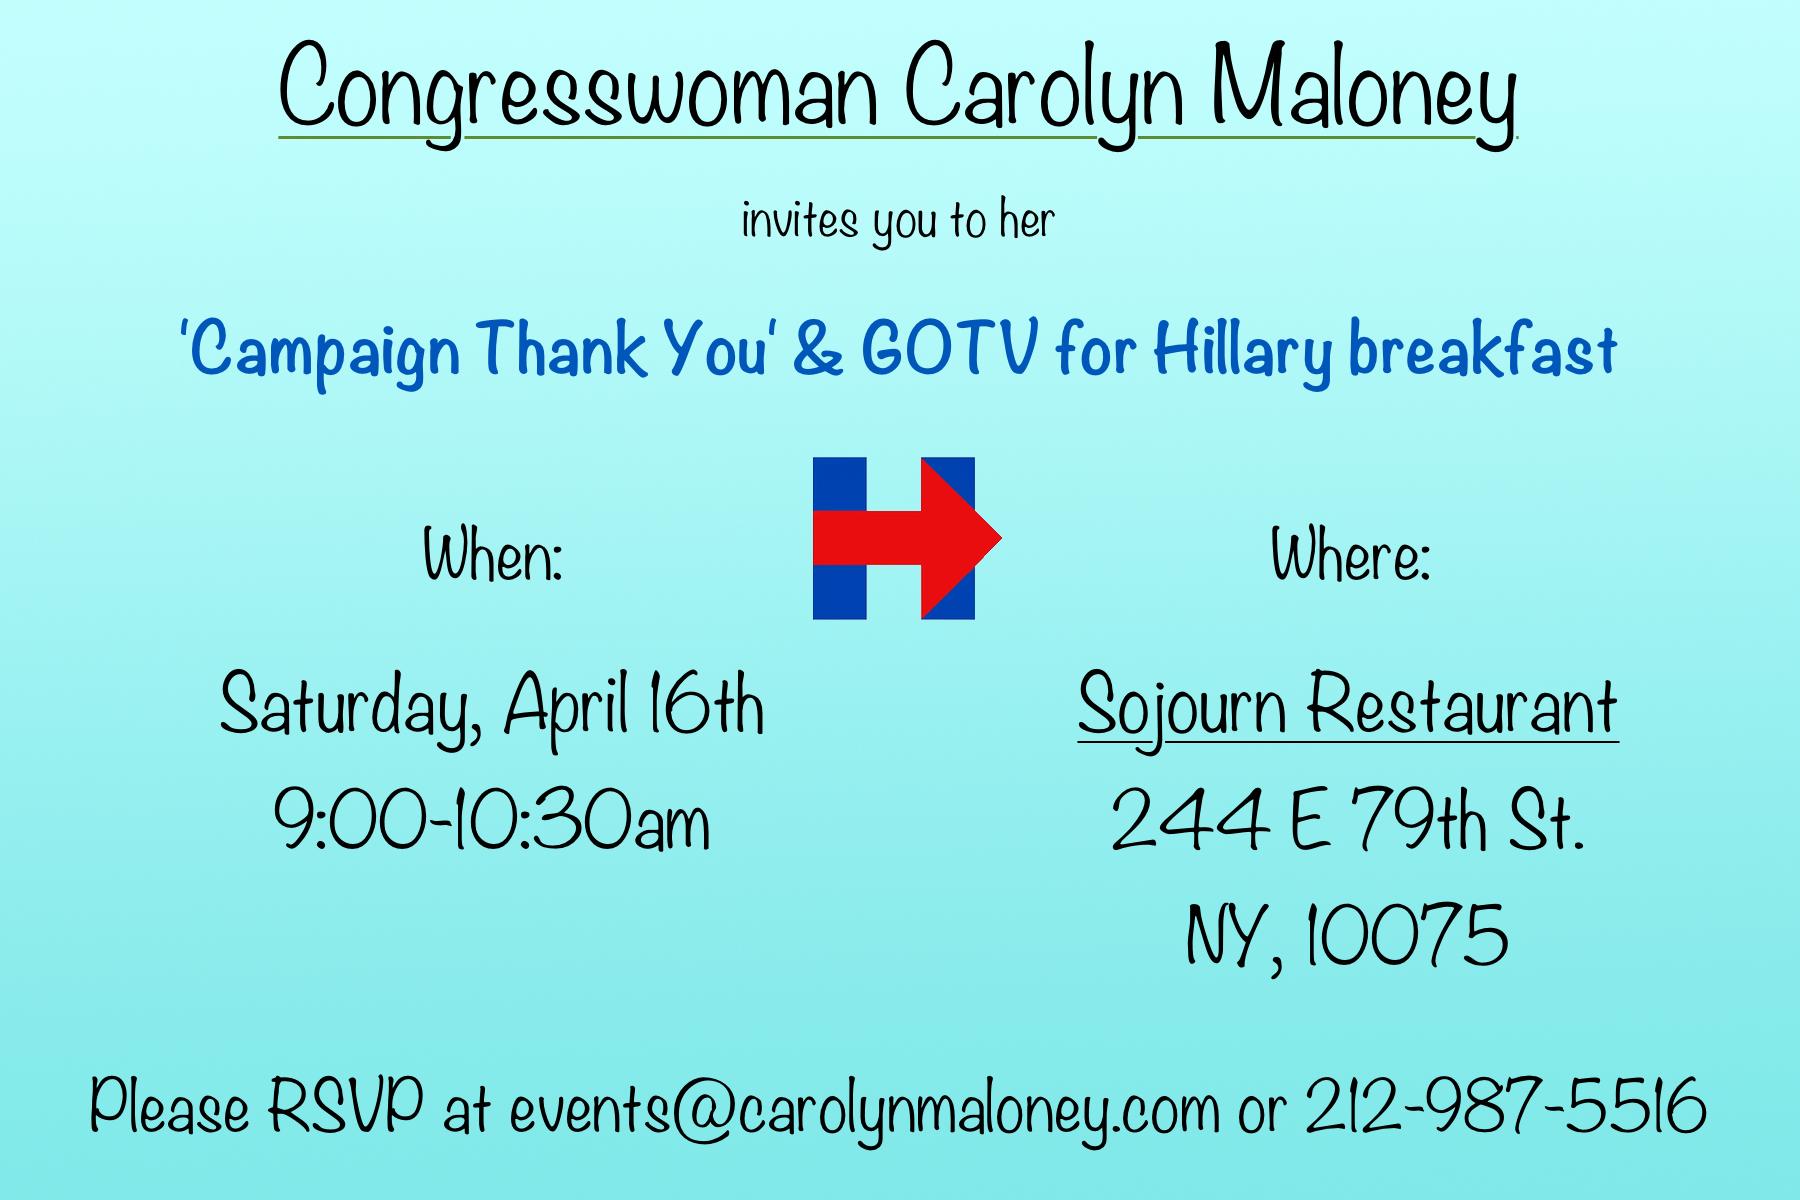 Campaign_thank_you_breakfast_invite.jpg